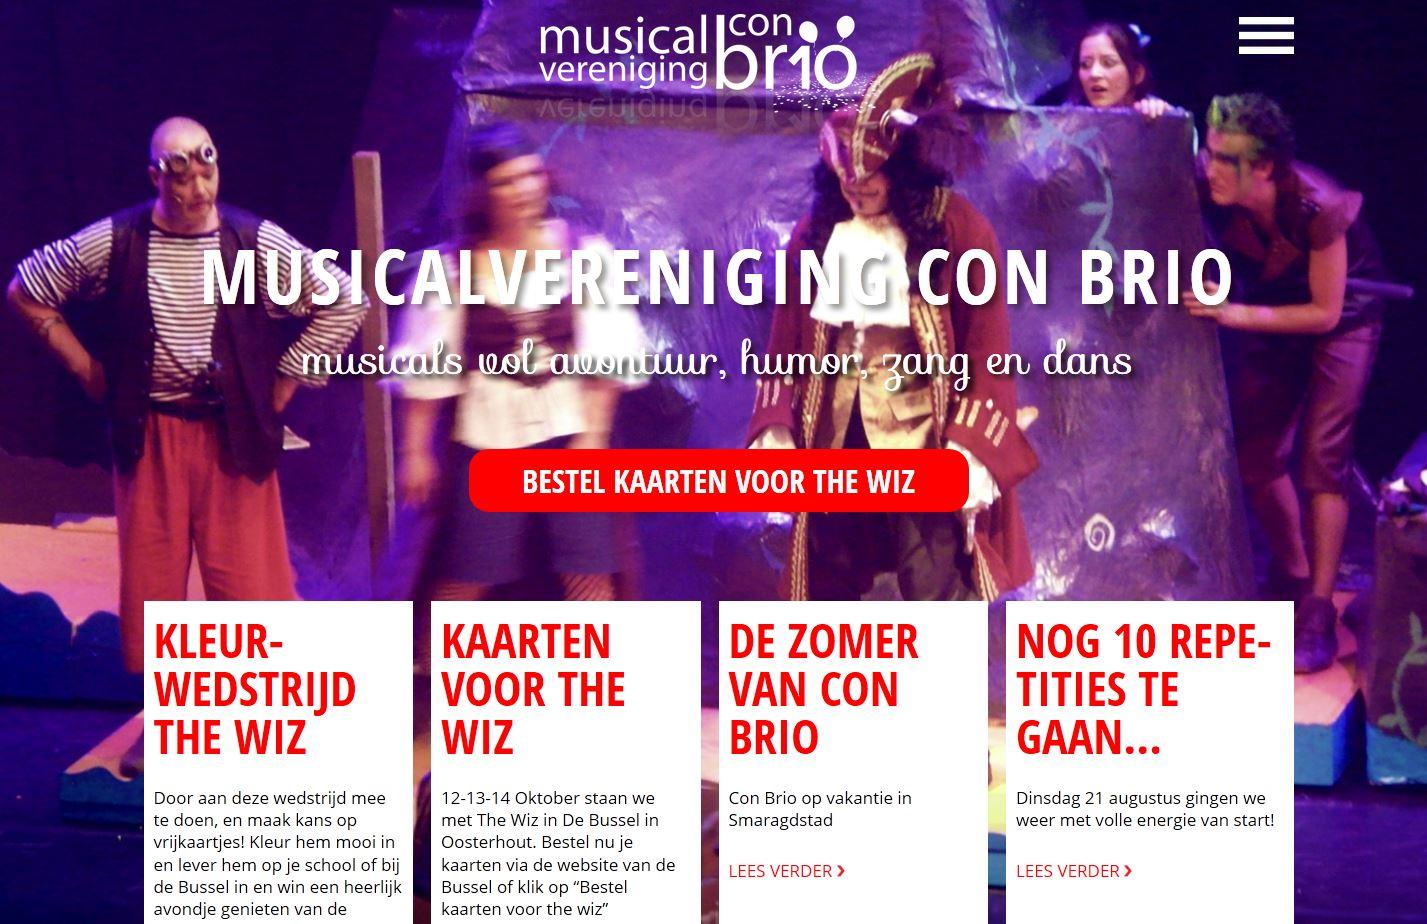 Voorpagina nieuwe website Musicalvereniging Con Brio.